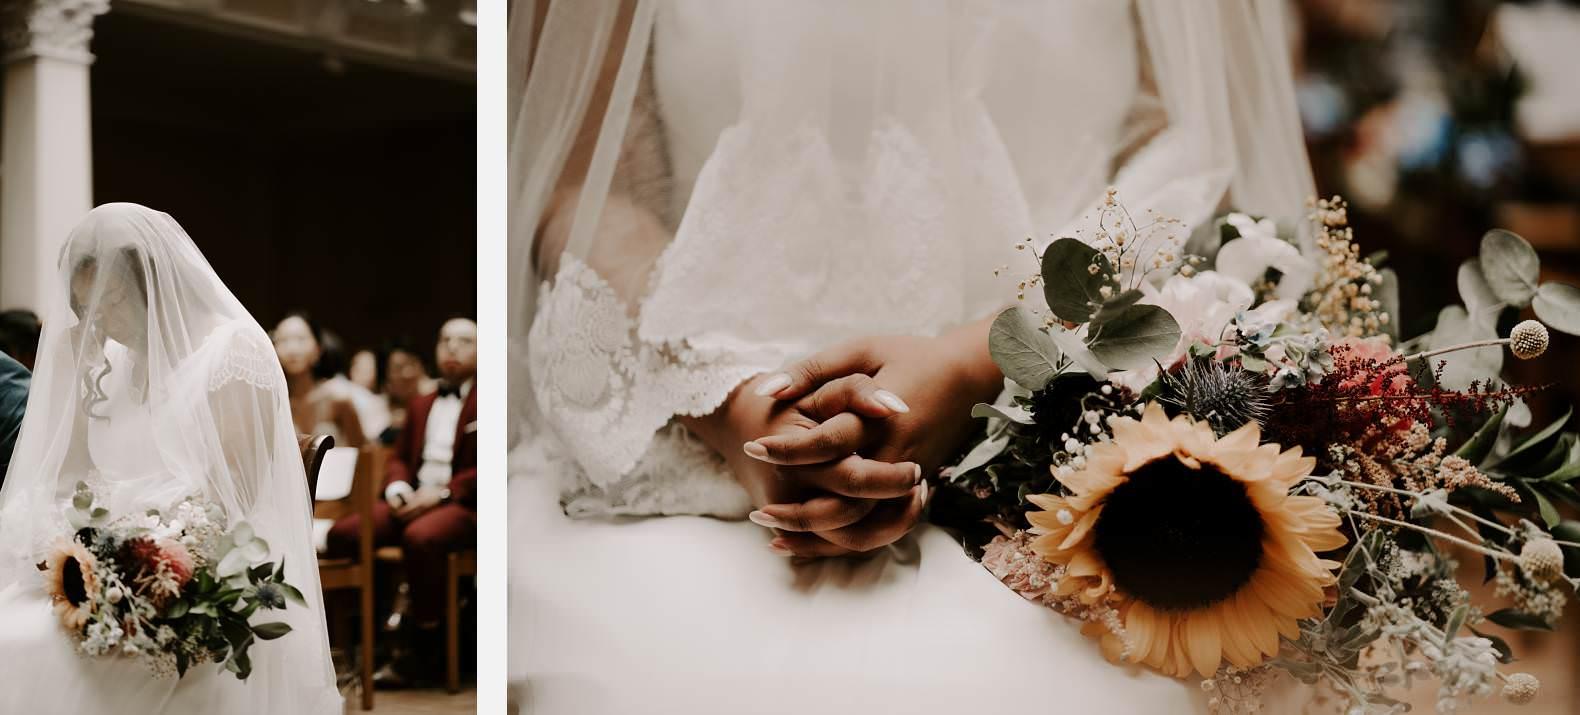 mariage manoir de corny photographe bel esprit 0026 1